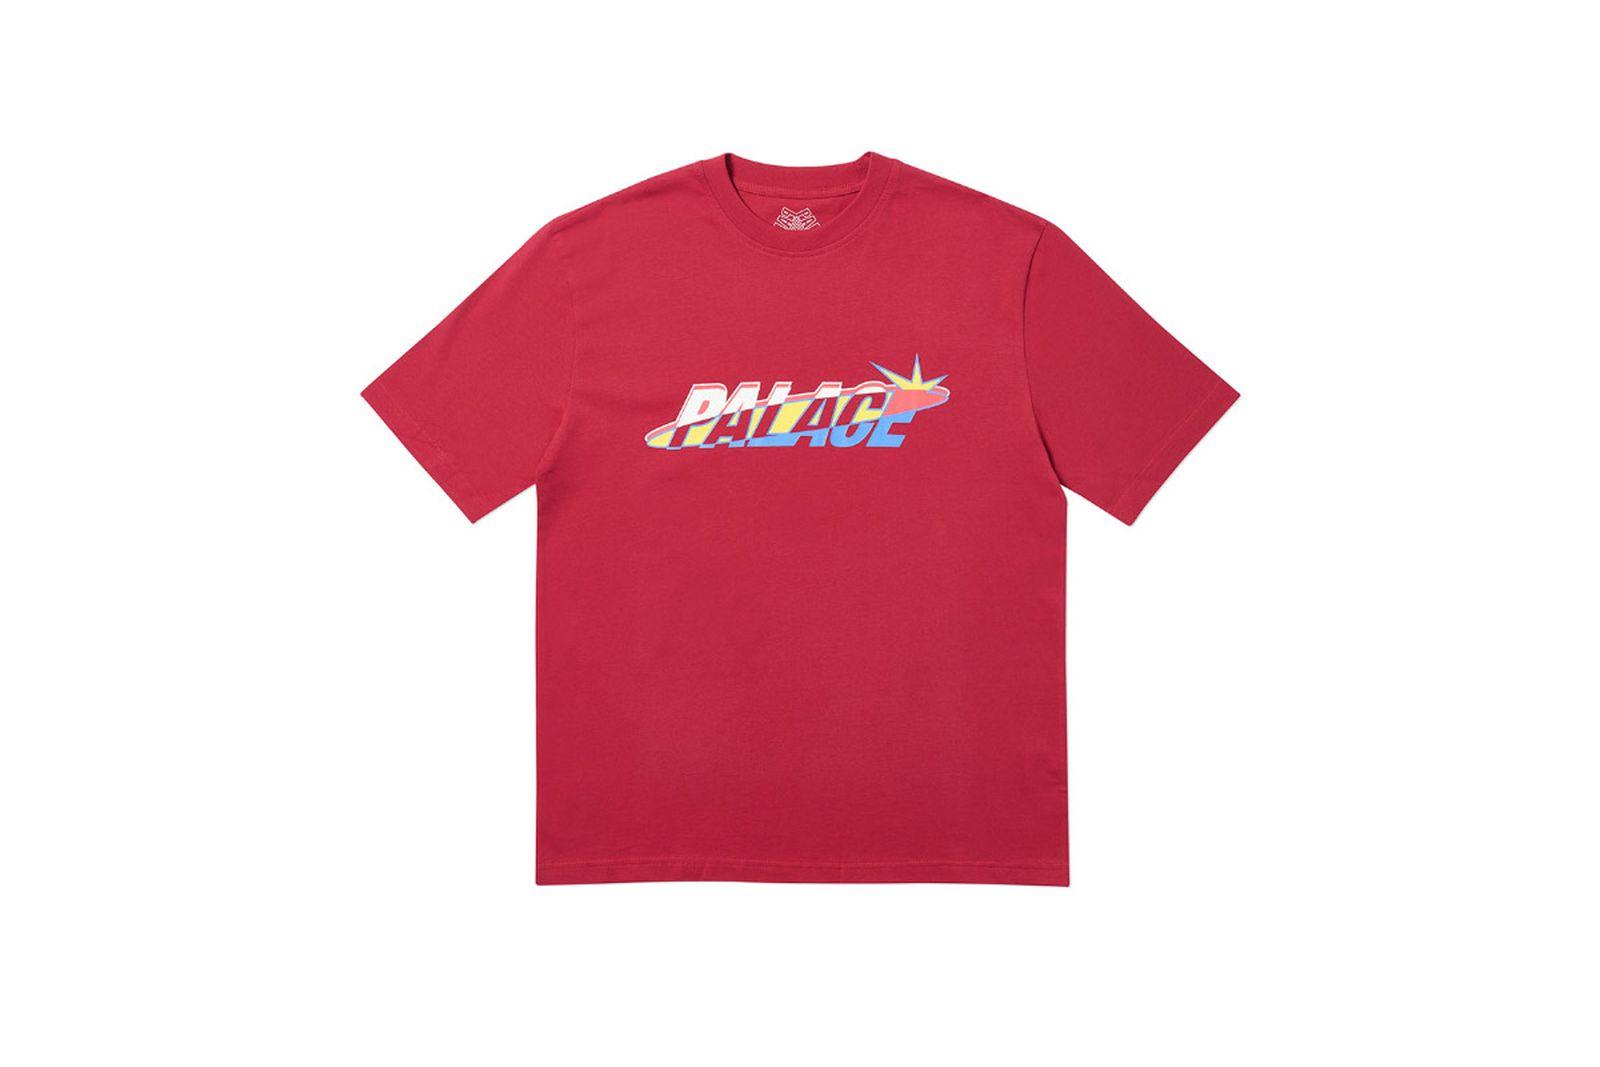 Palace 2019 Autumn T Shirt Lique dark red